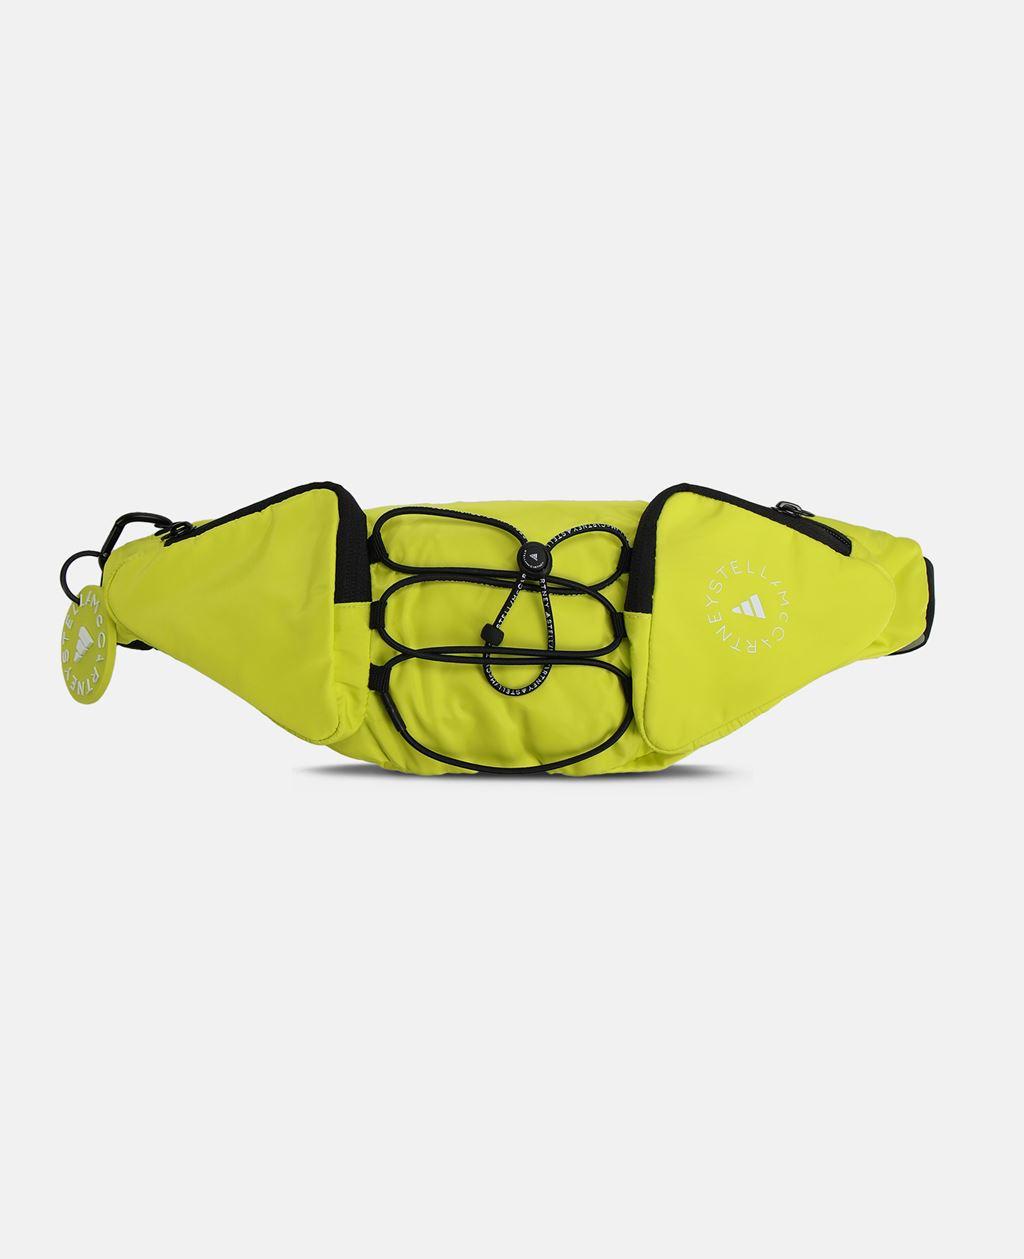 Stella McCartney Citrus Yellow Running Bum bag